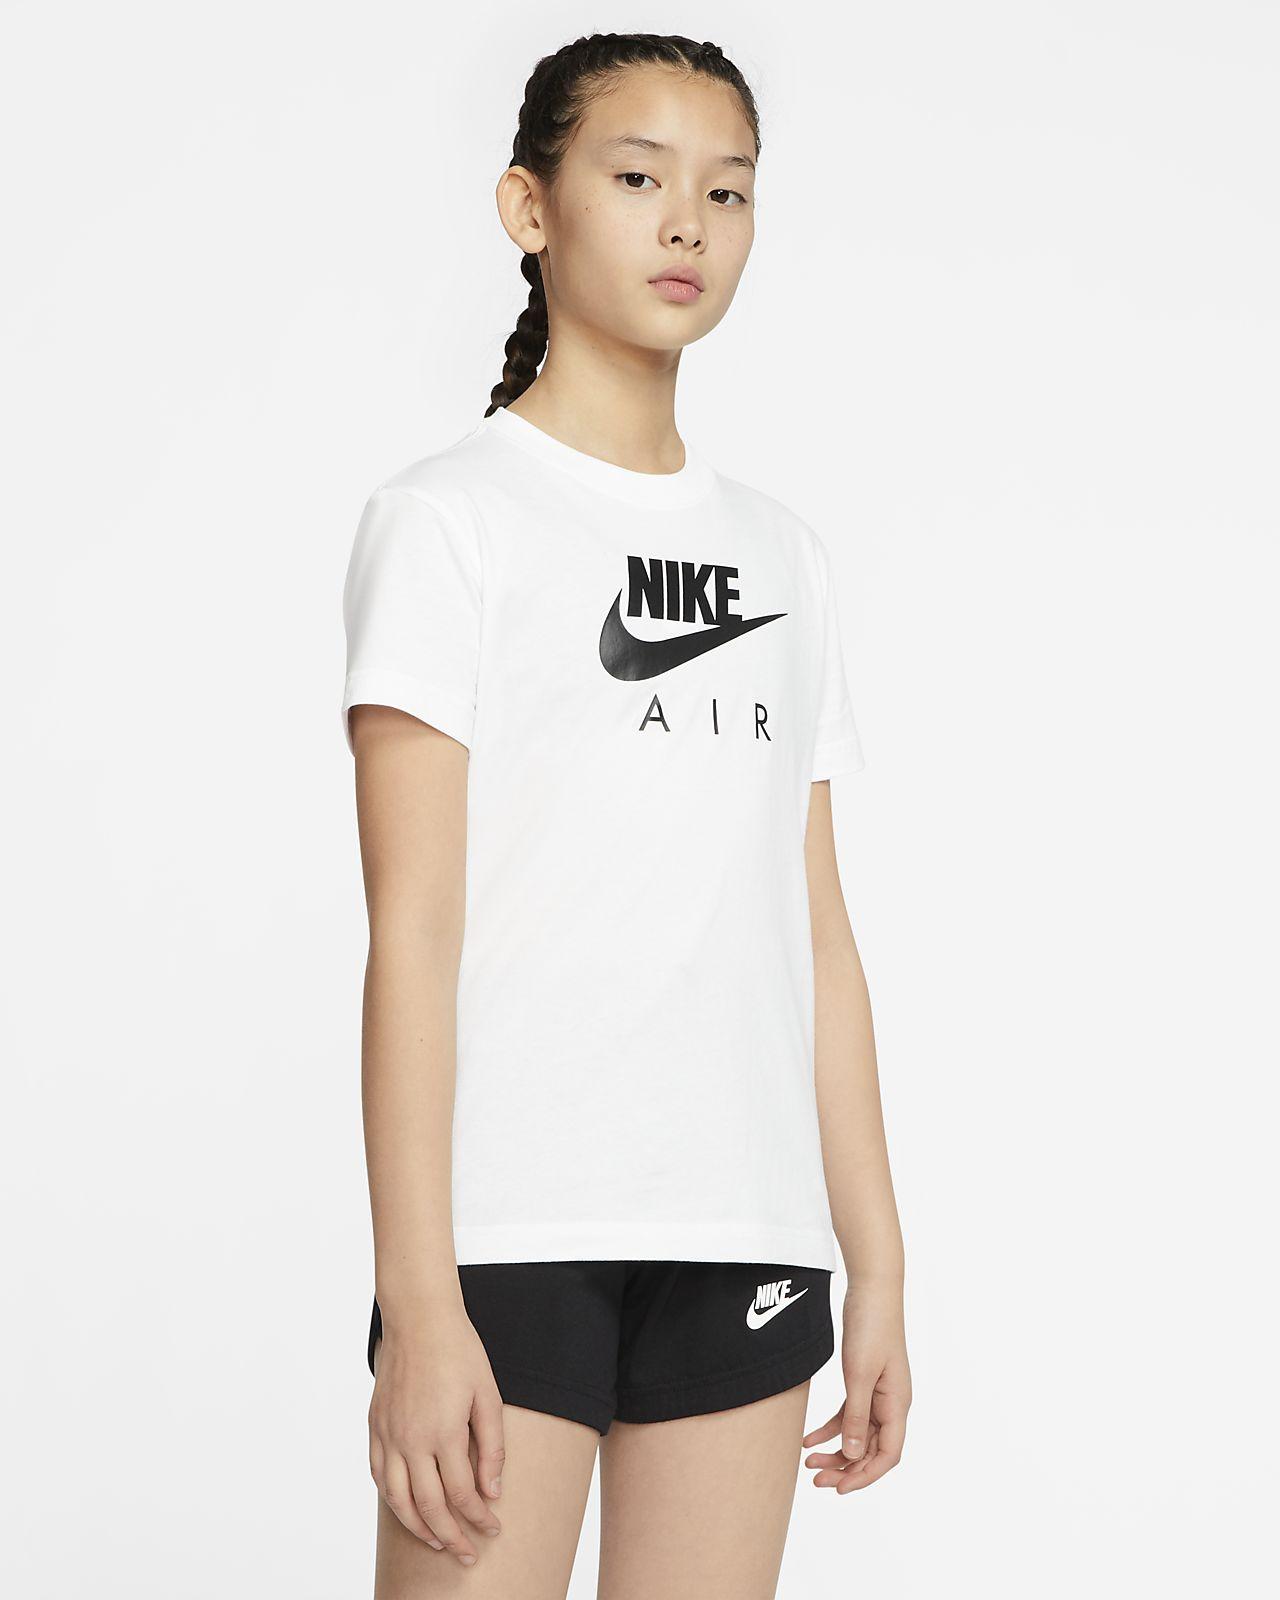 Nike Air 5 T shirt black white